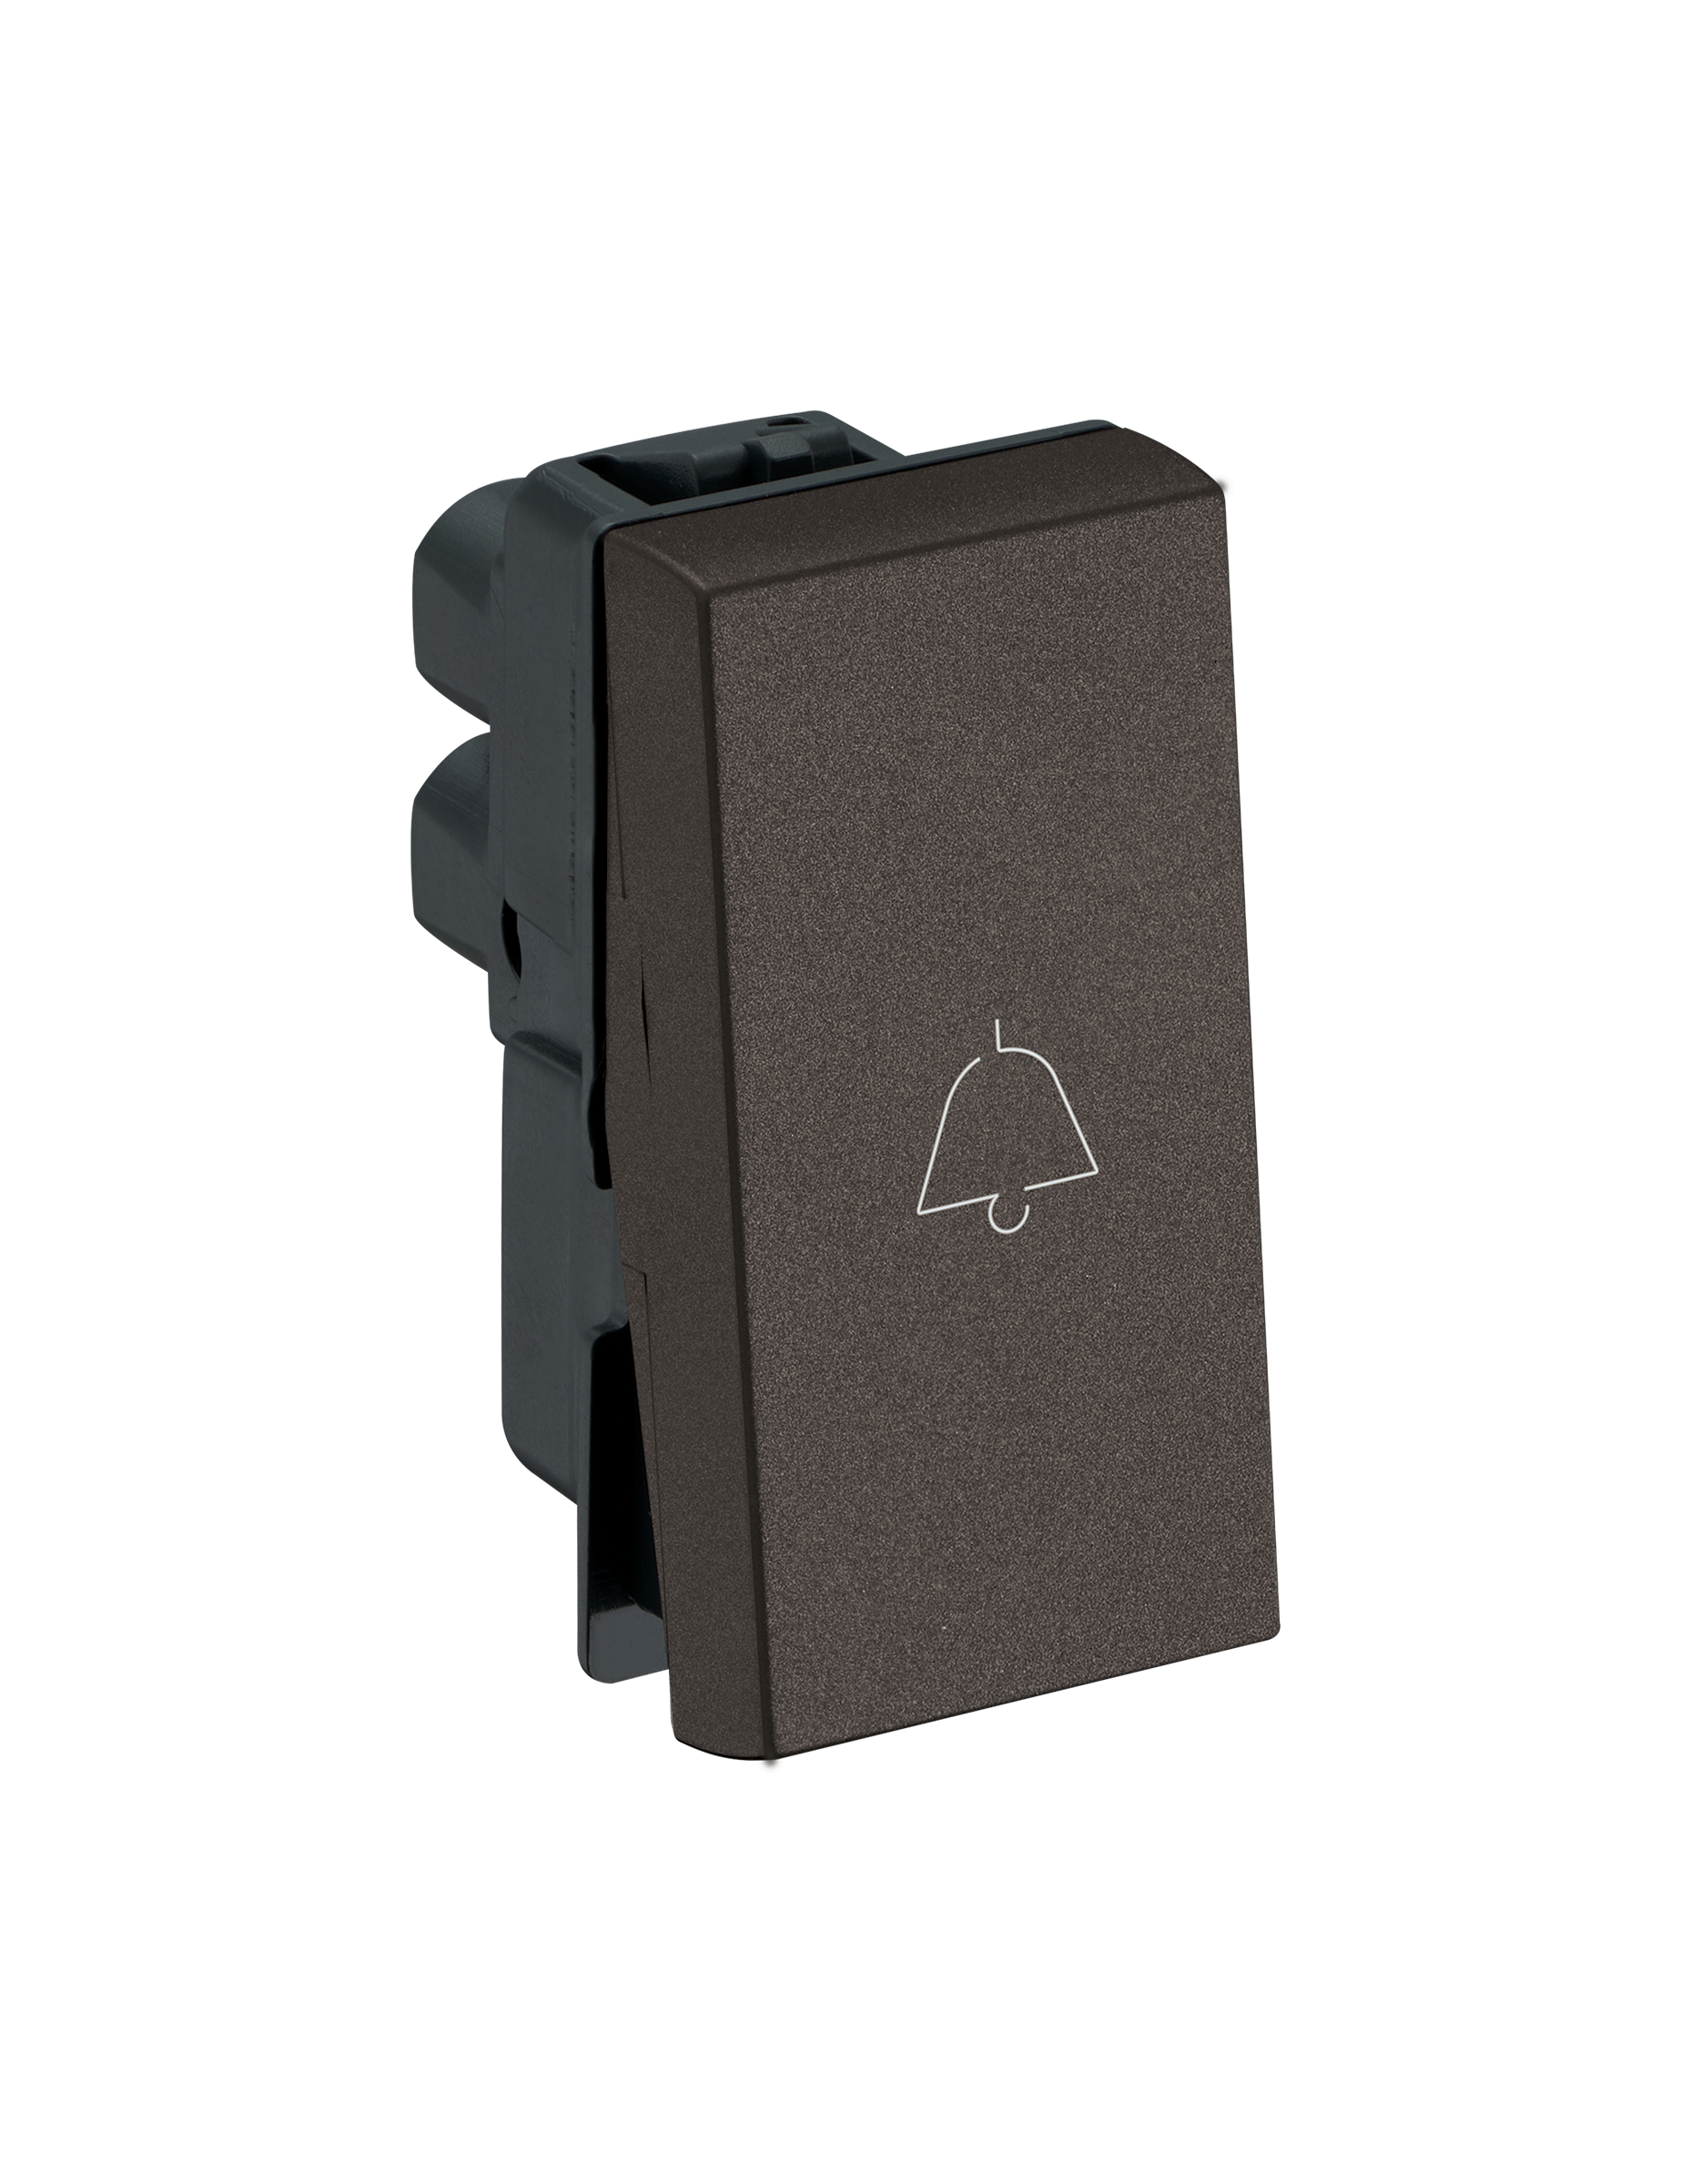 Myrius Nextgen 6A Bell Push 1 Way 1M Charcoal Grey